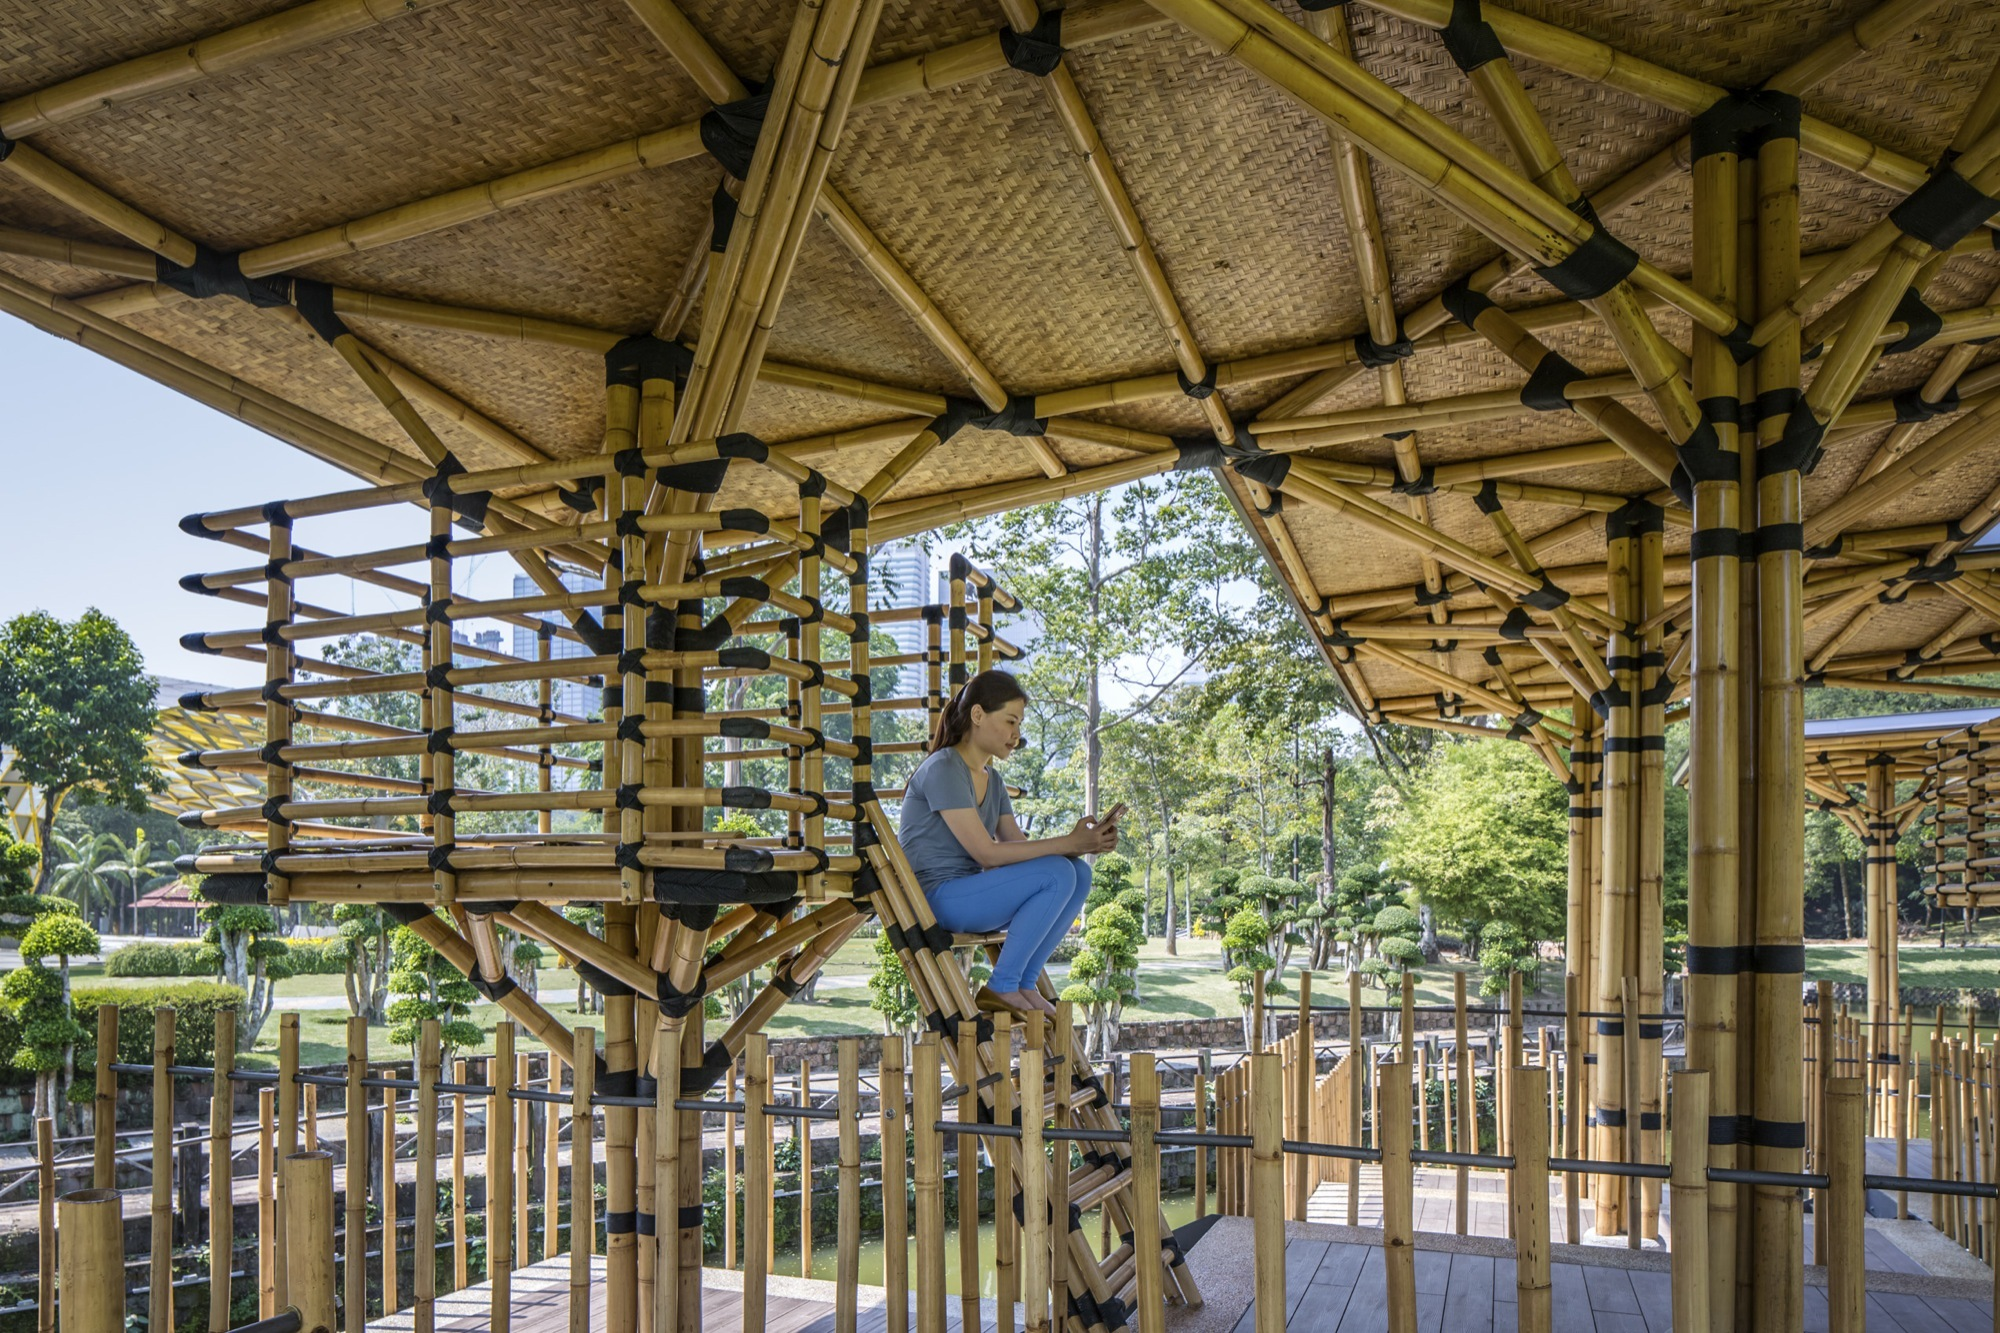 Gallery Of The Bamboo Playhouse Eleena Jamil Architect 9